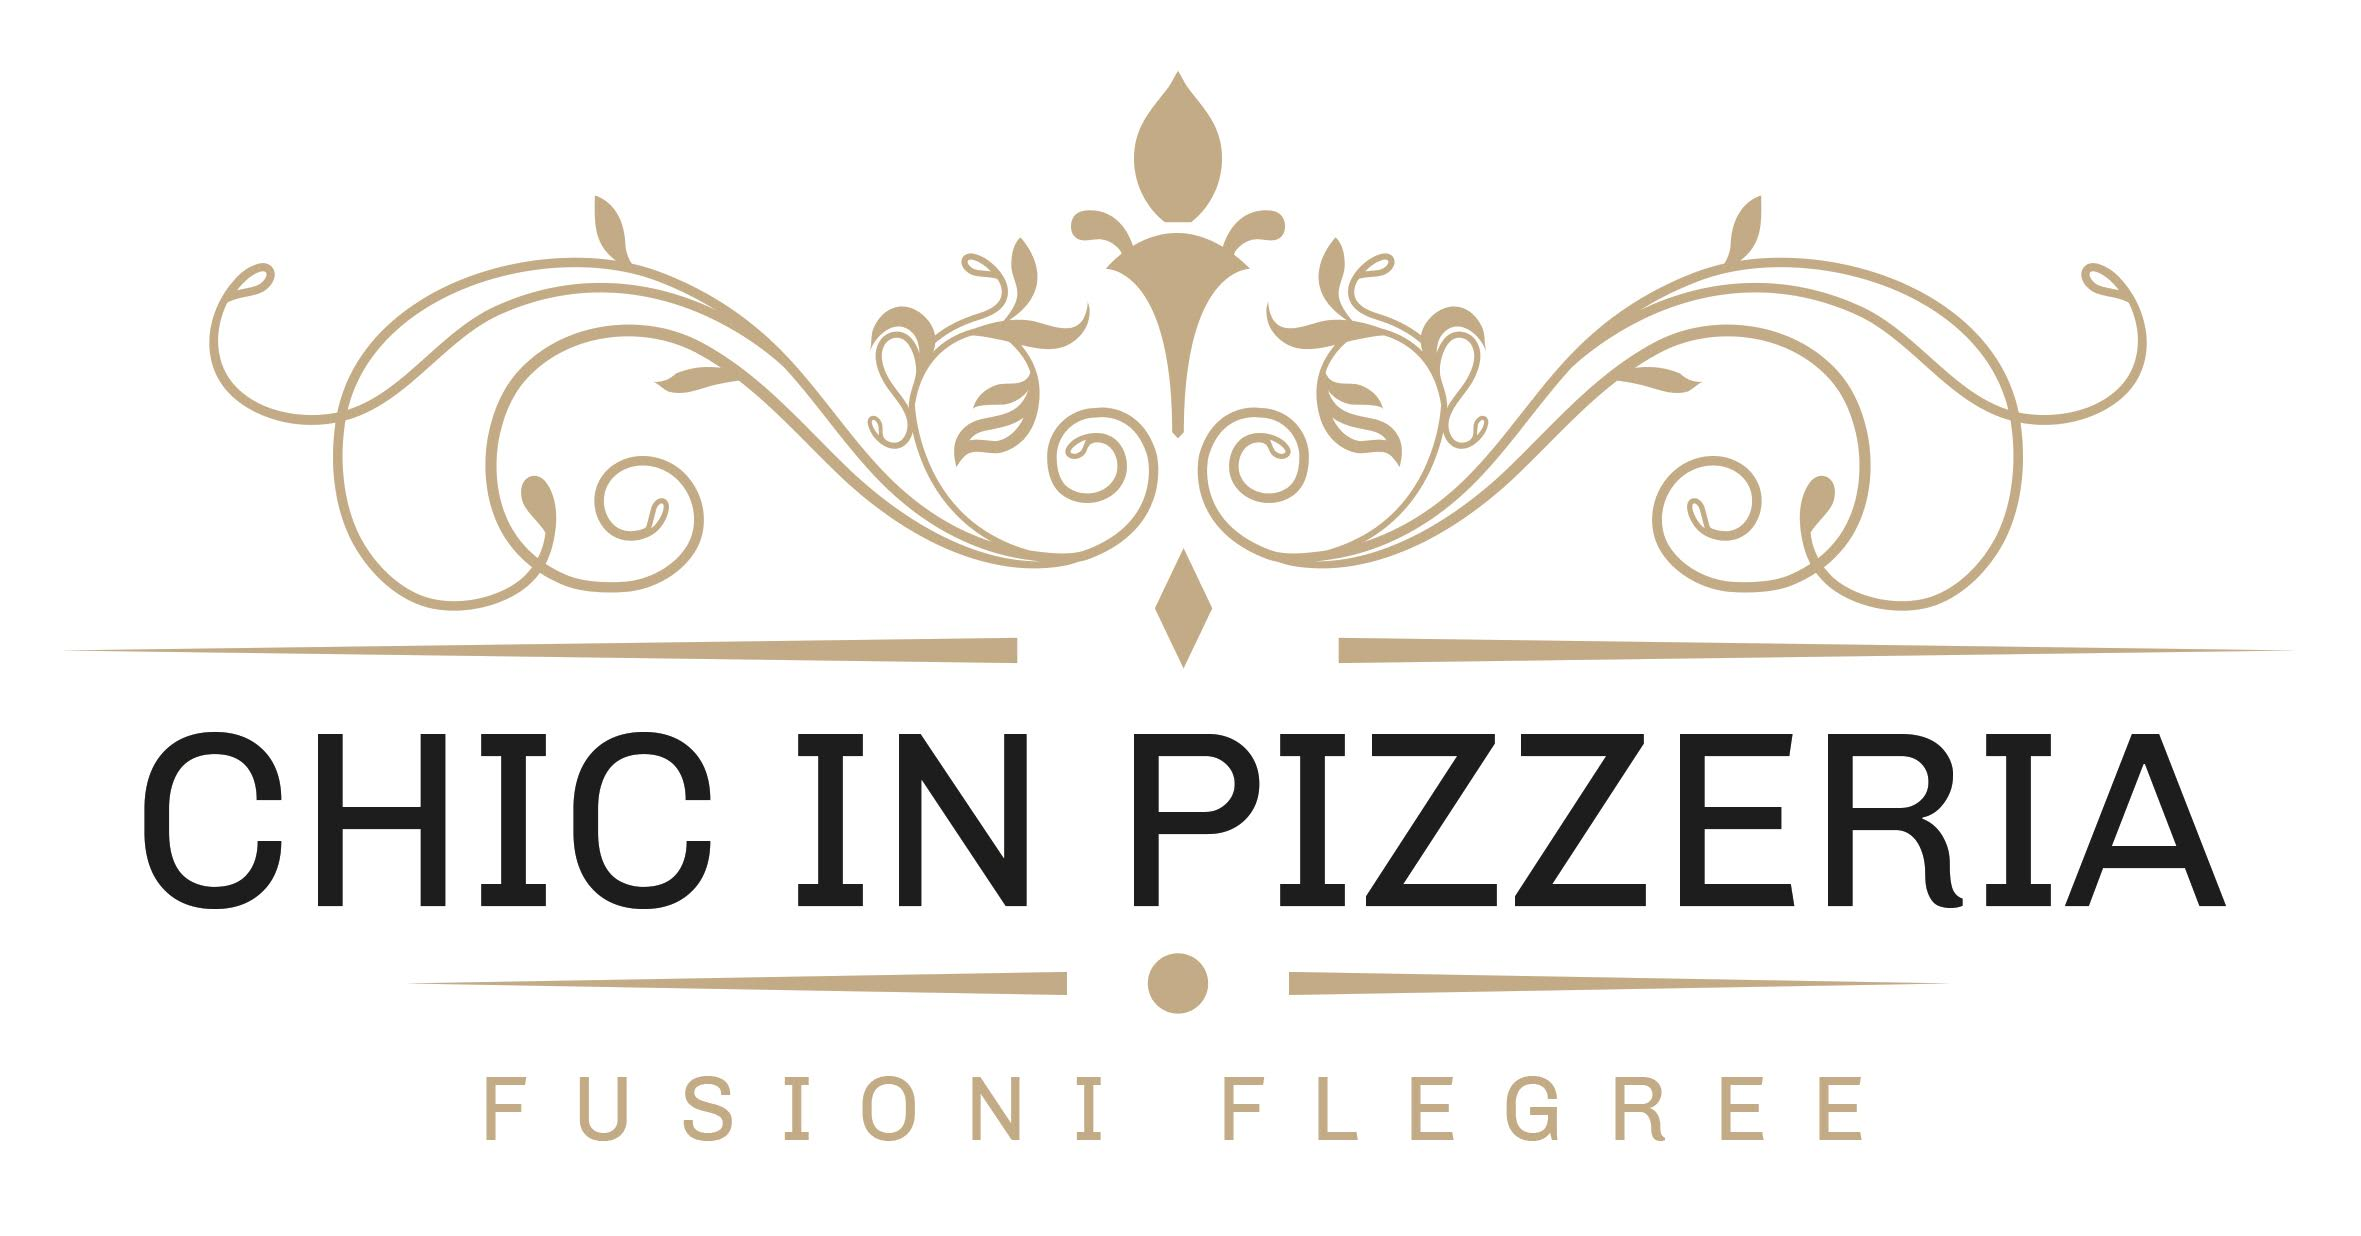 CHIC in pizzeria